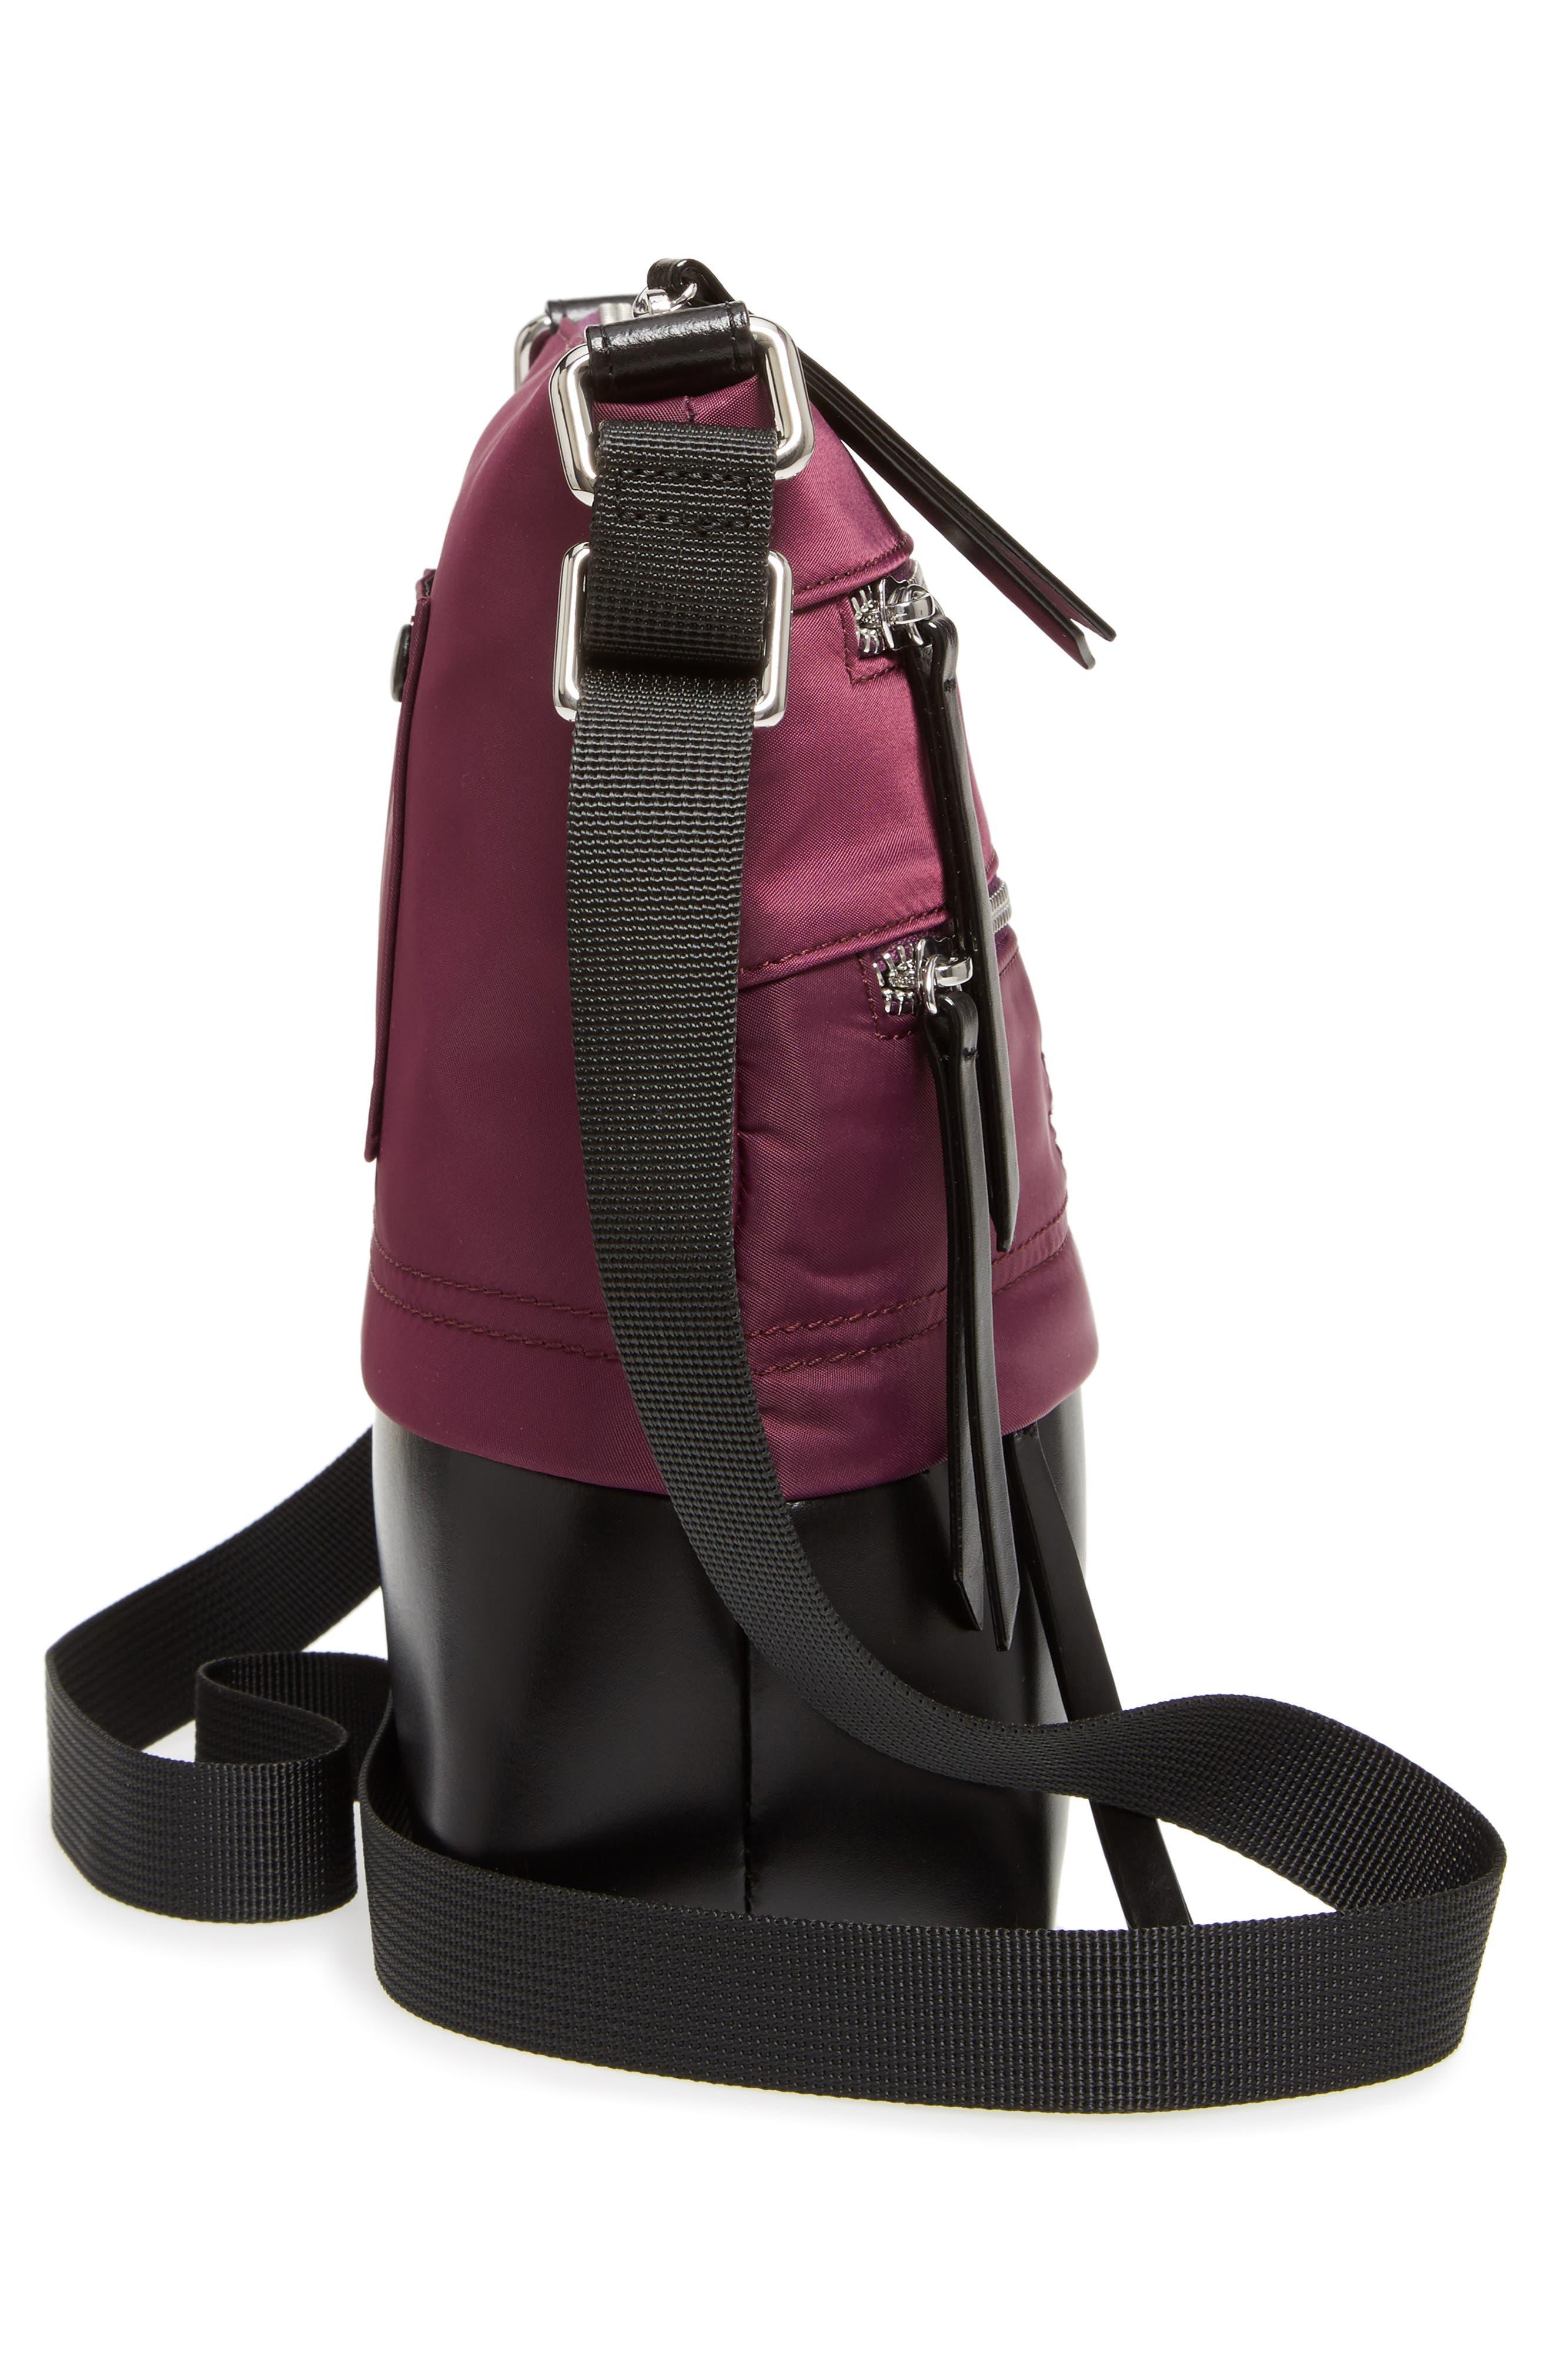 Wanda RFID Nylon & Leather Crossbody Bag,                             Alternate thumbnail 5, color,                             500